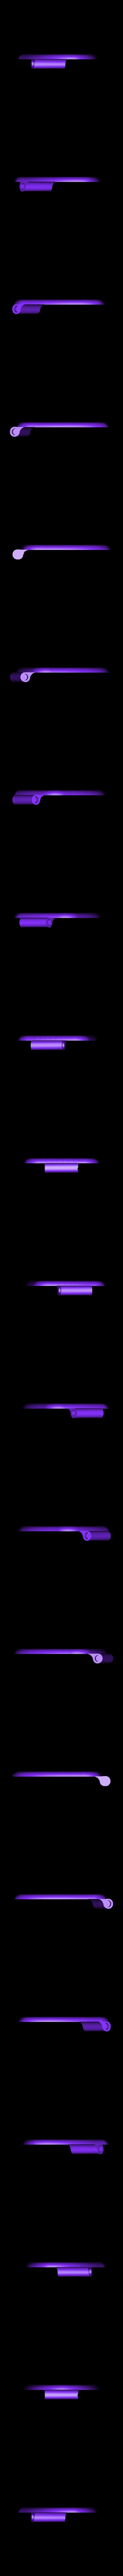 86Duino-Toilet-3.STL Download free STL file 86Duino Toilet • 3D printable object, 86Duino